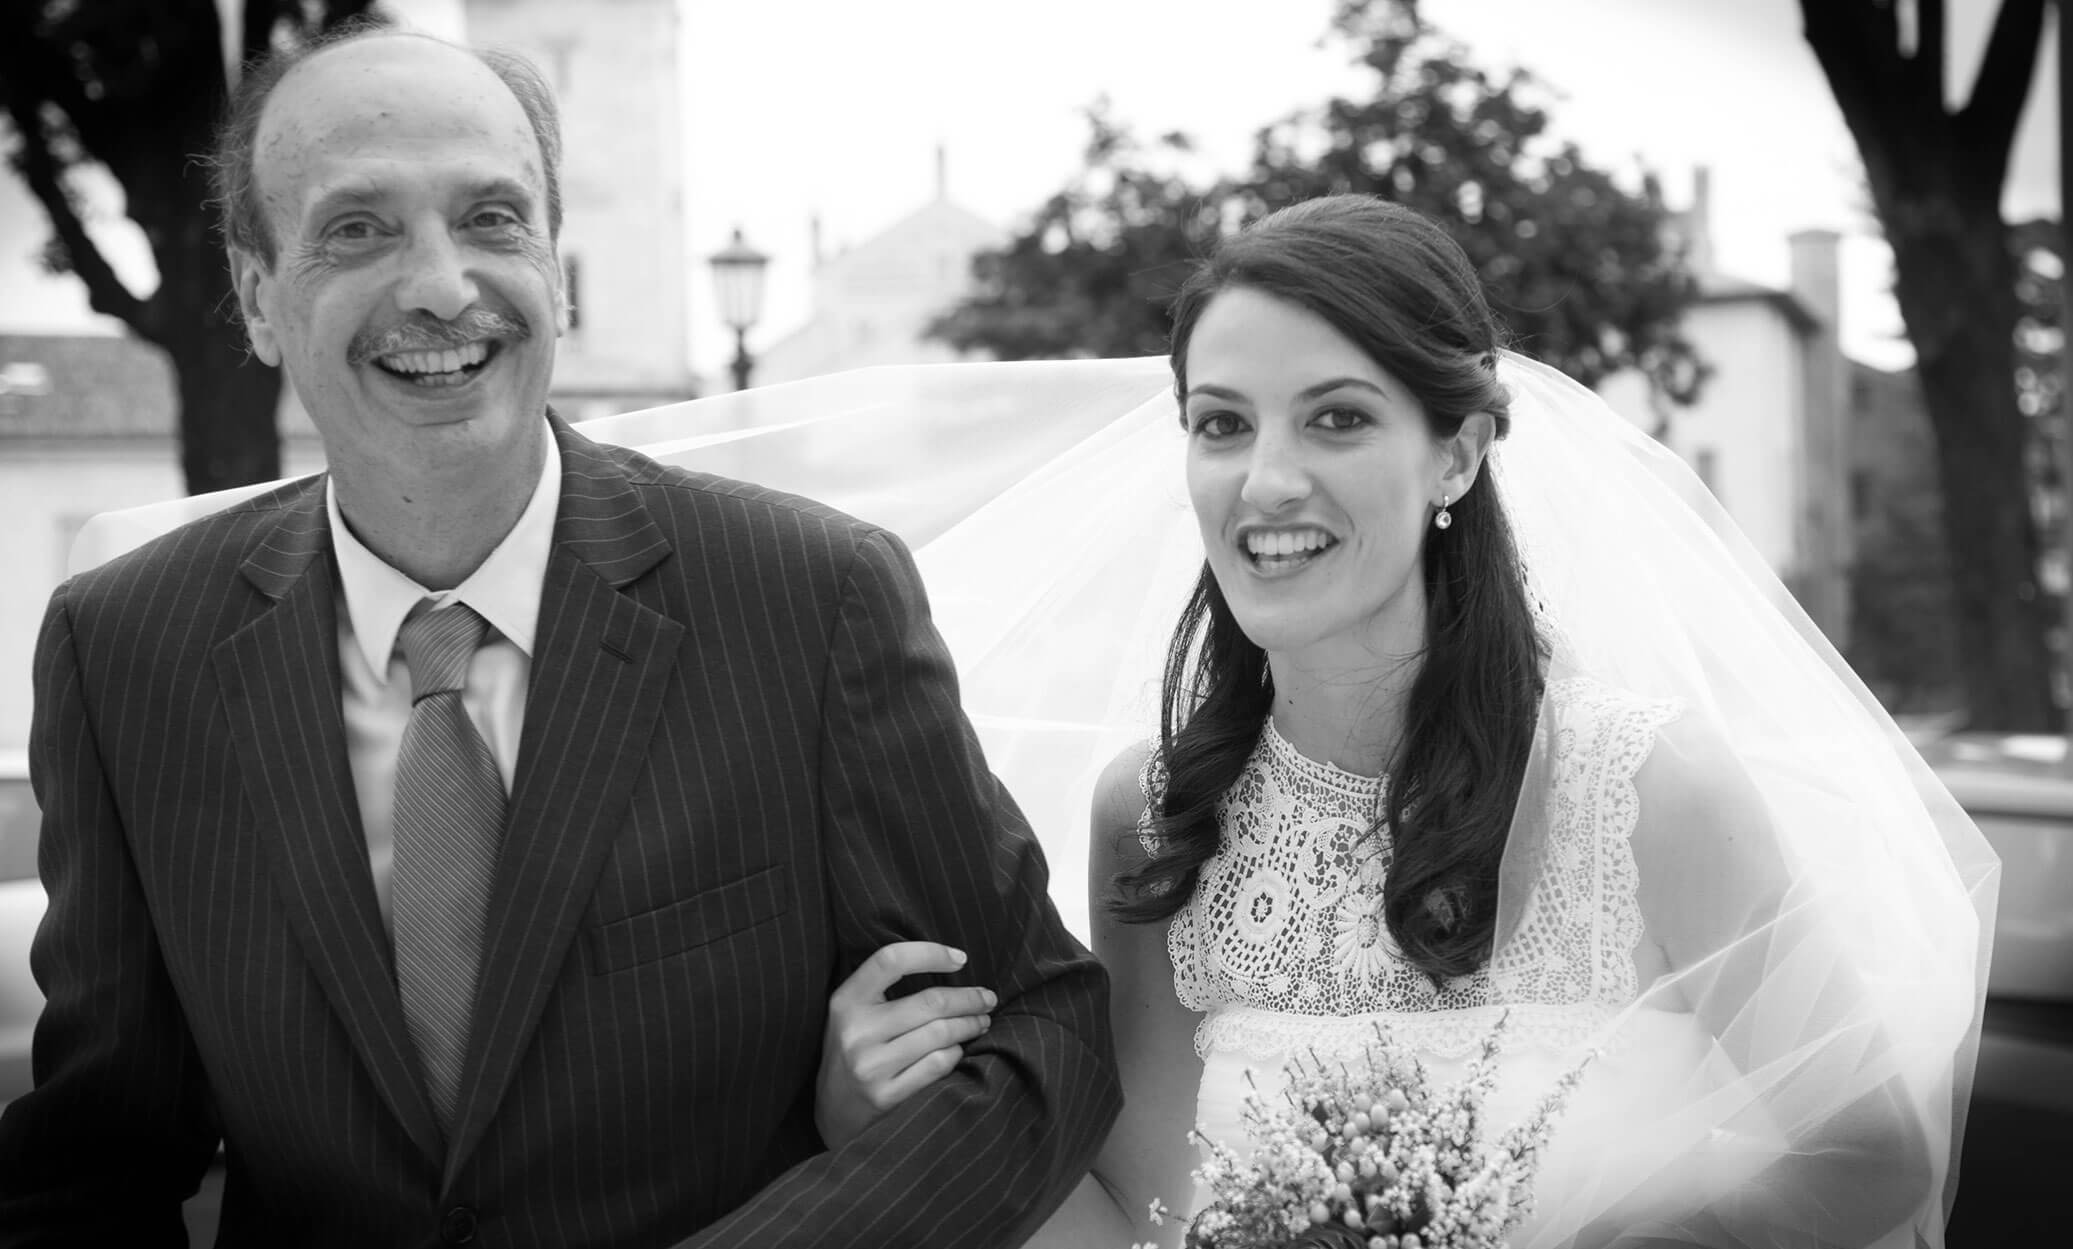 Francesca-Ferrati-wedding-photographer-Verona-Elena-Tommaso8